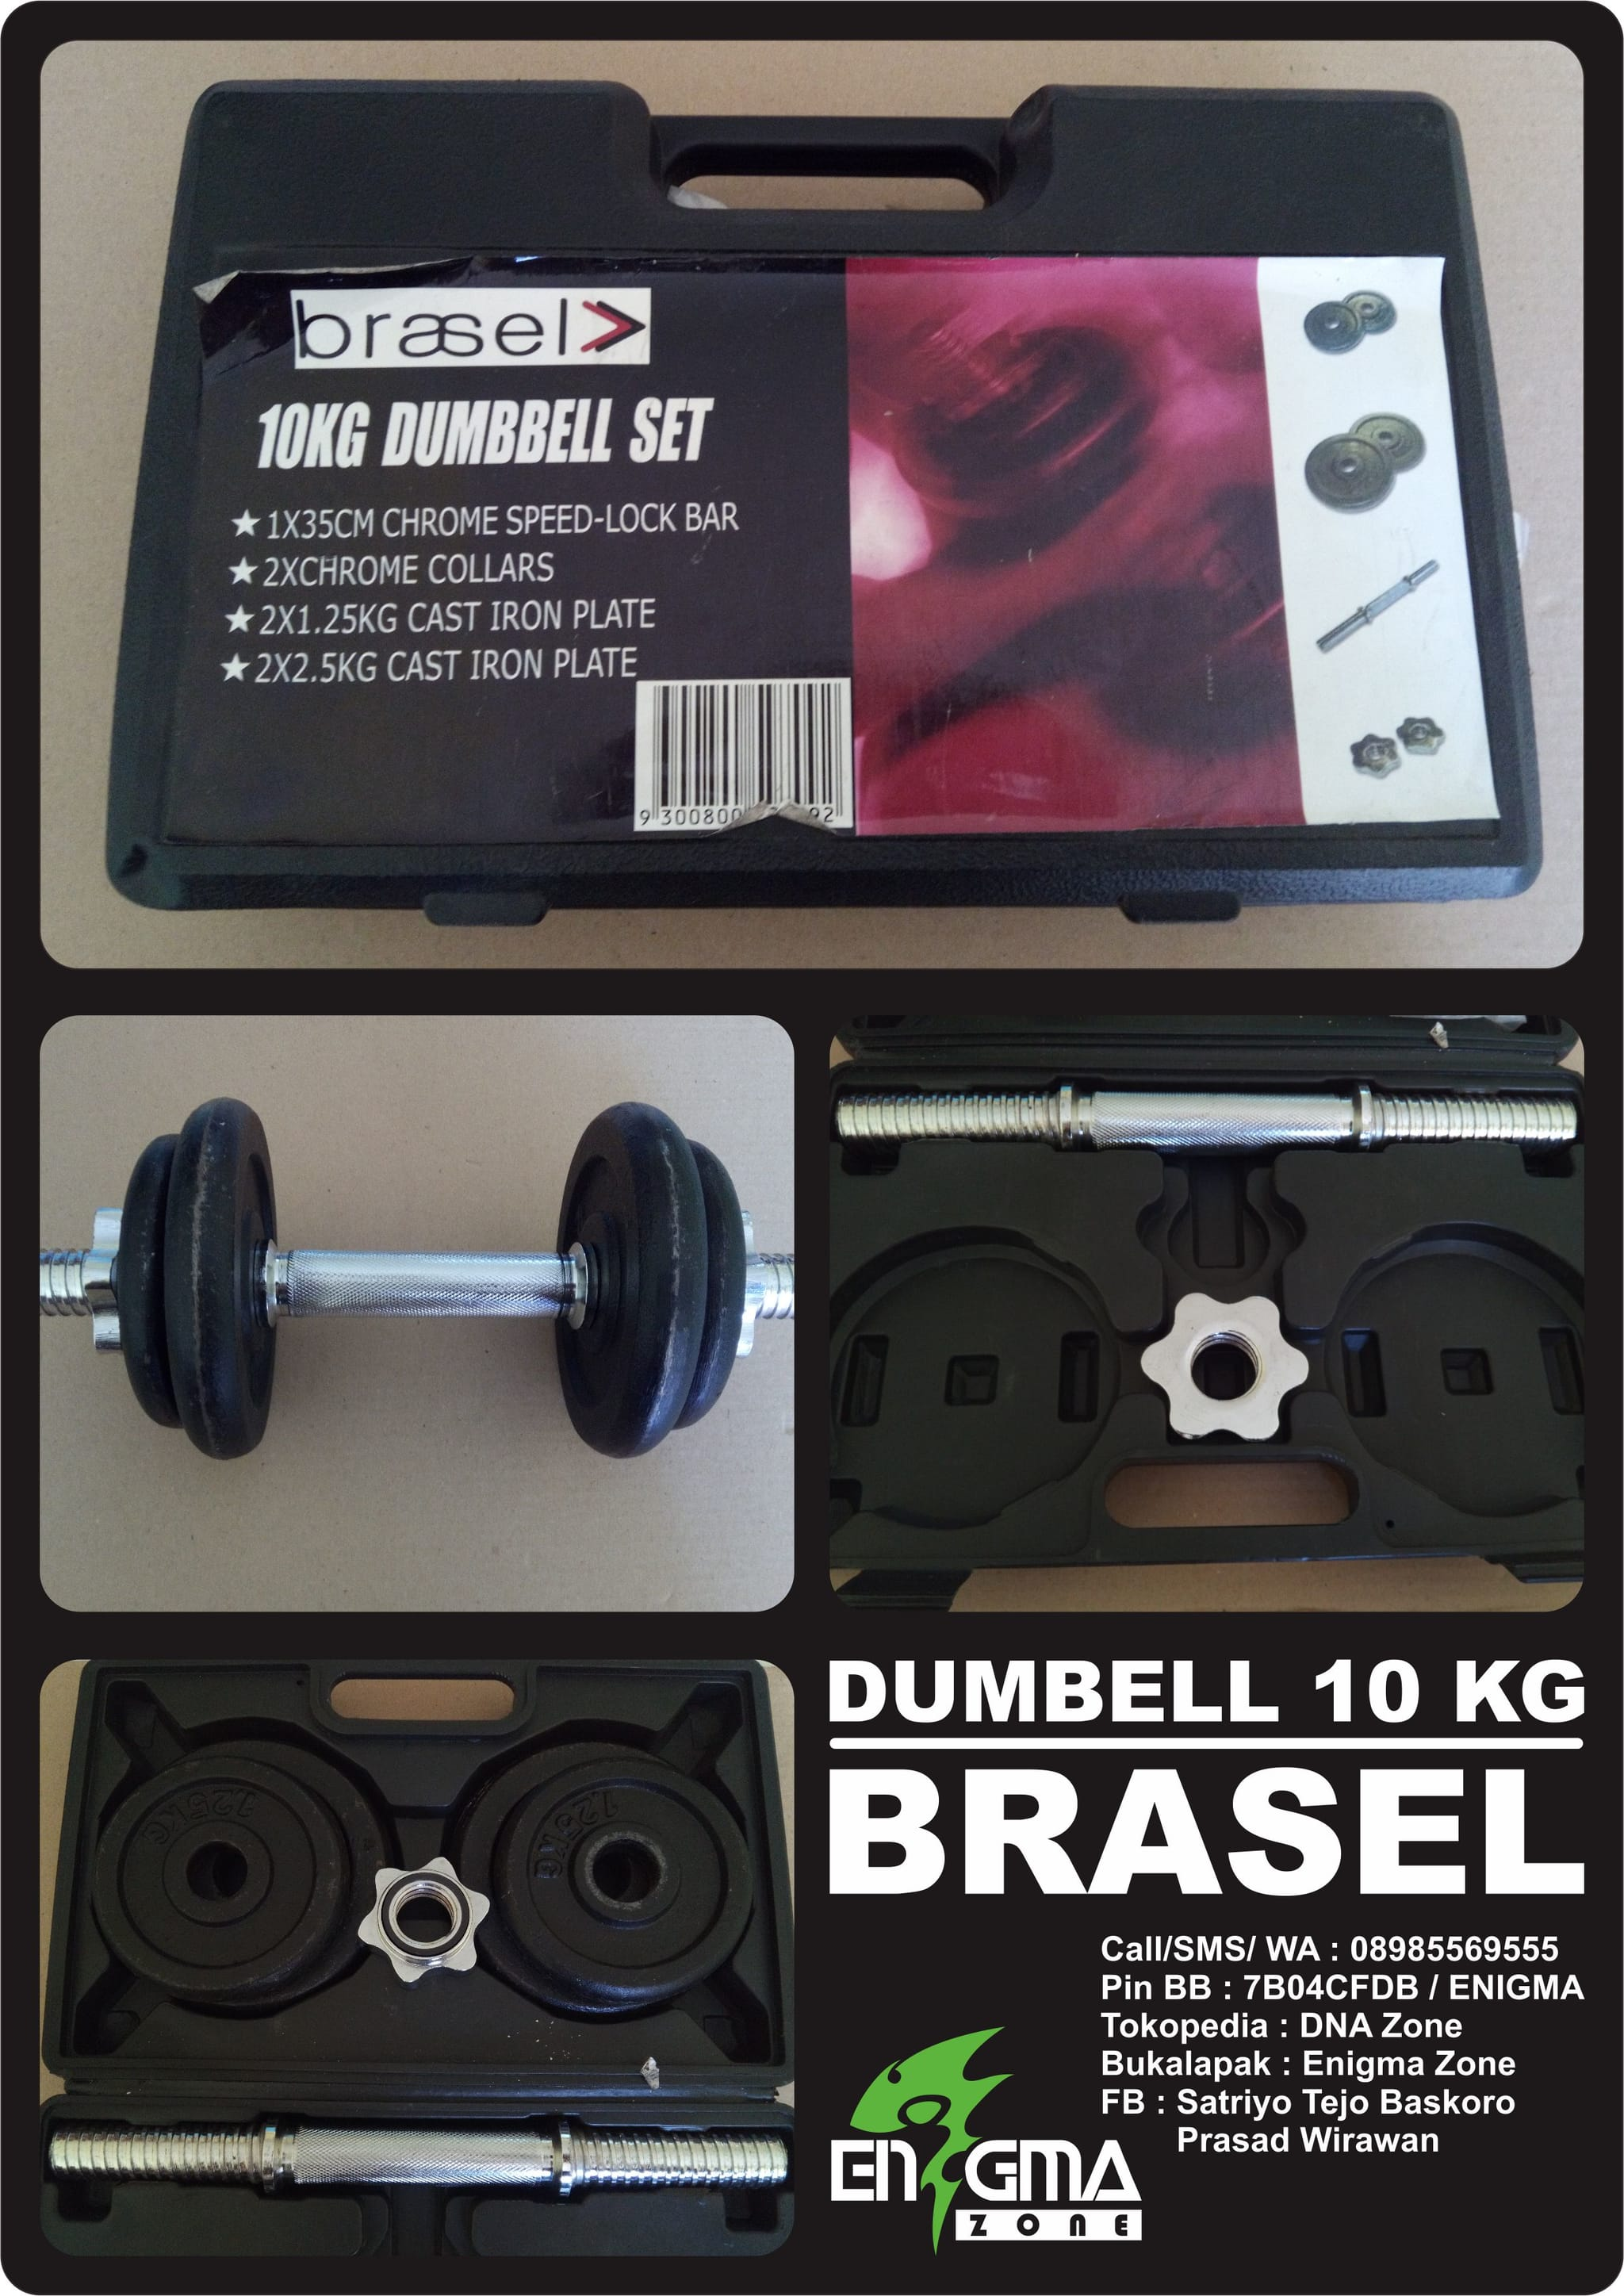 Jual Dumbell Set 10 Kg Merk Brasel Barbel Fitnes Gym Enigmazone Dna Zone Tokopedia